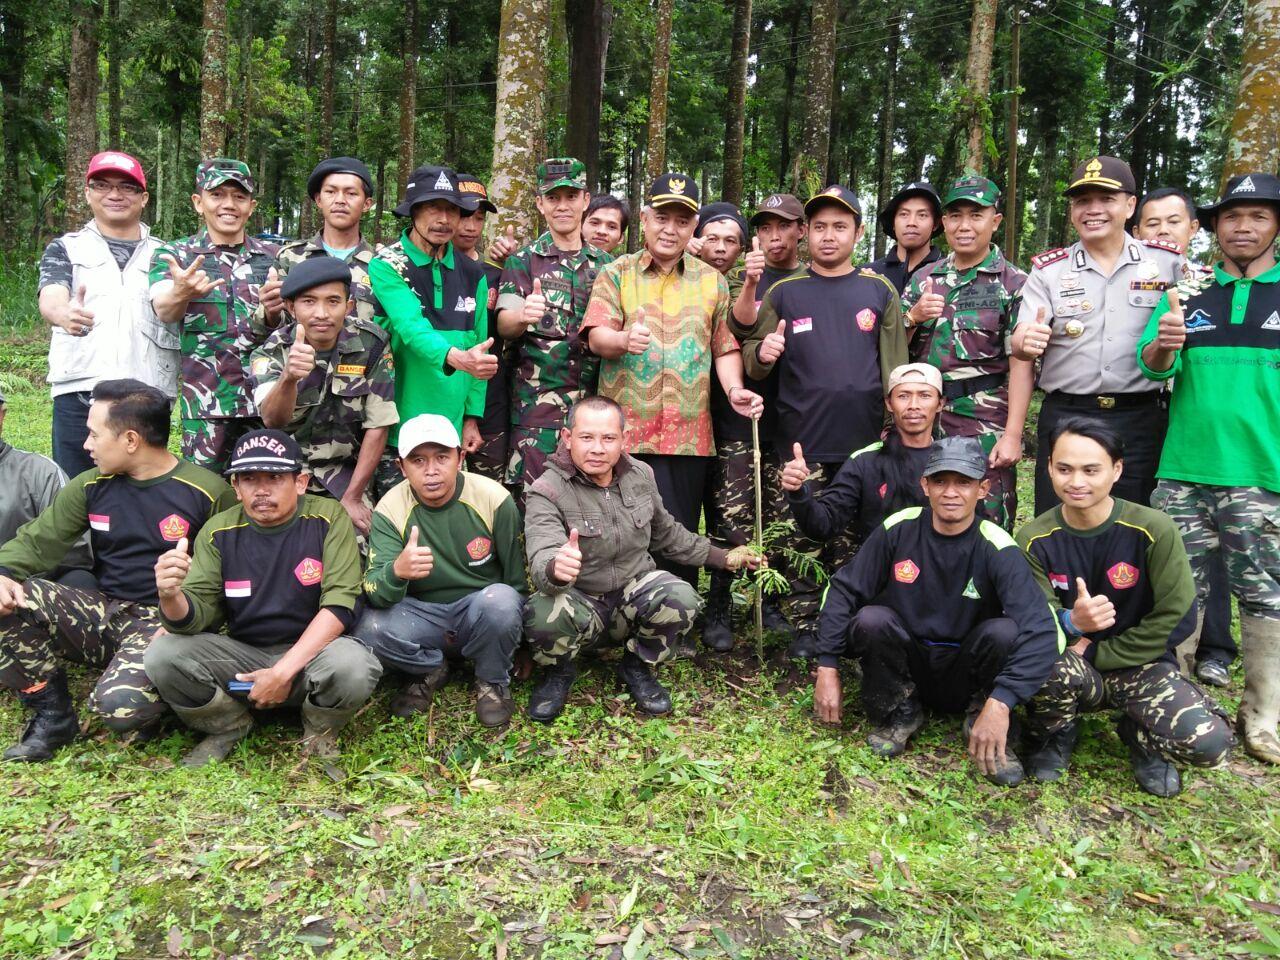 Bhabinkamtibmas Madiredo Polsek Pujon Polres Batu patroli sambang desa Dialogis Ke Pemuda